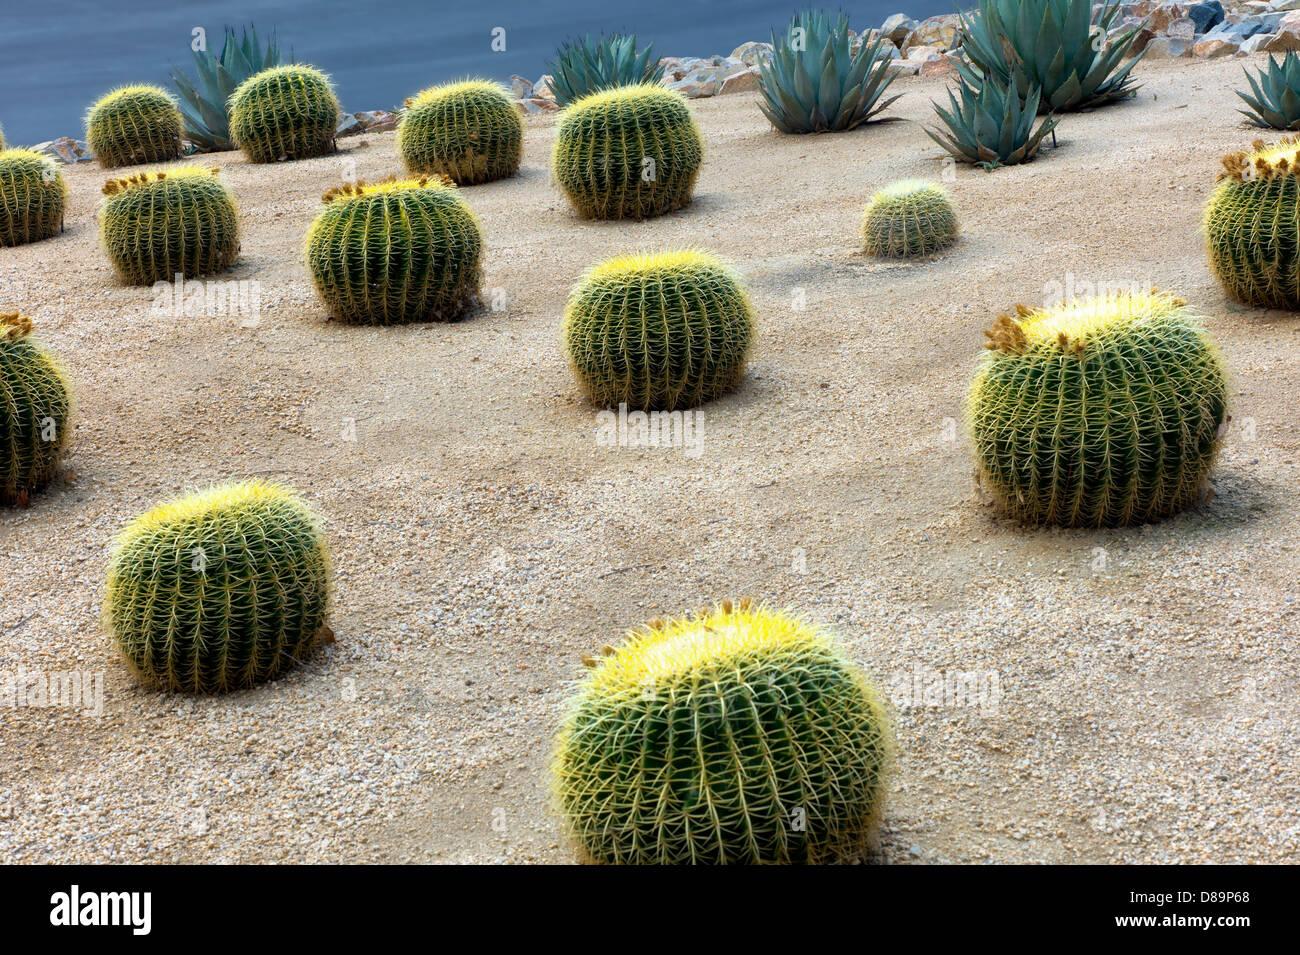 Golden barrell jardín de cactus. Palm Springs, California Imagen De Stock